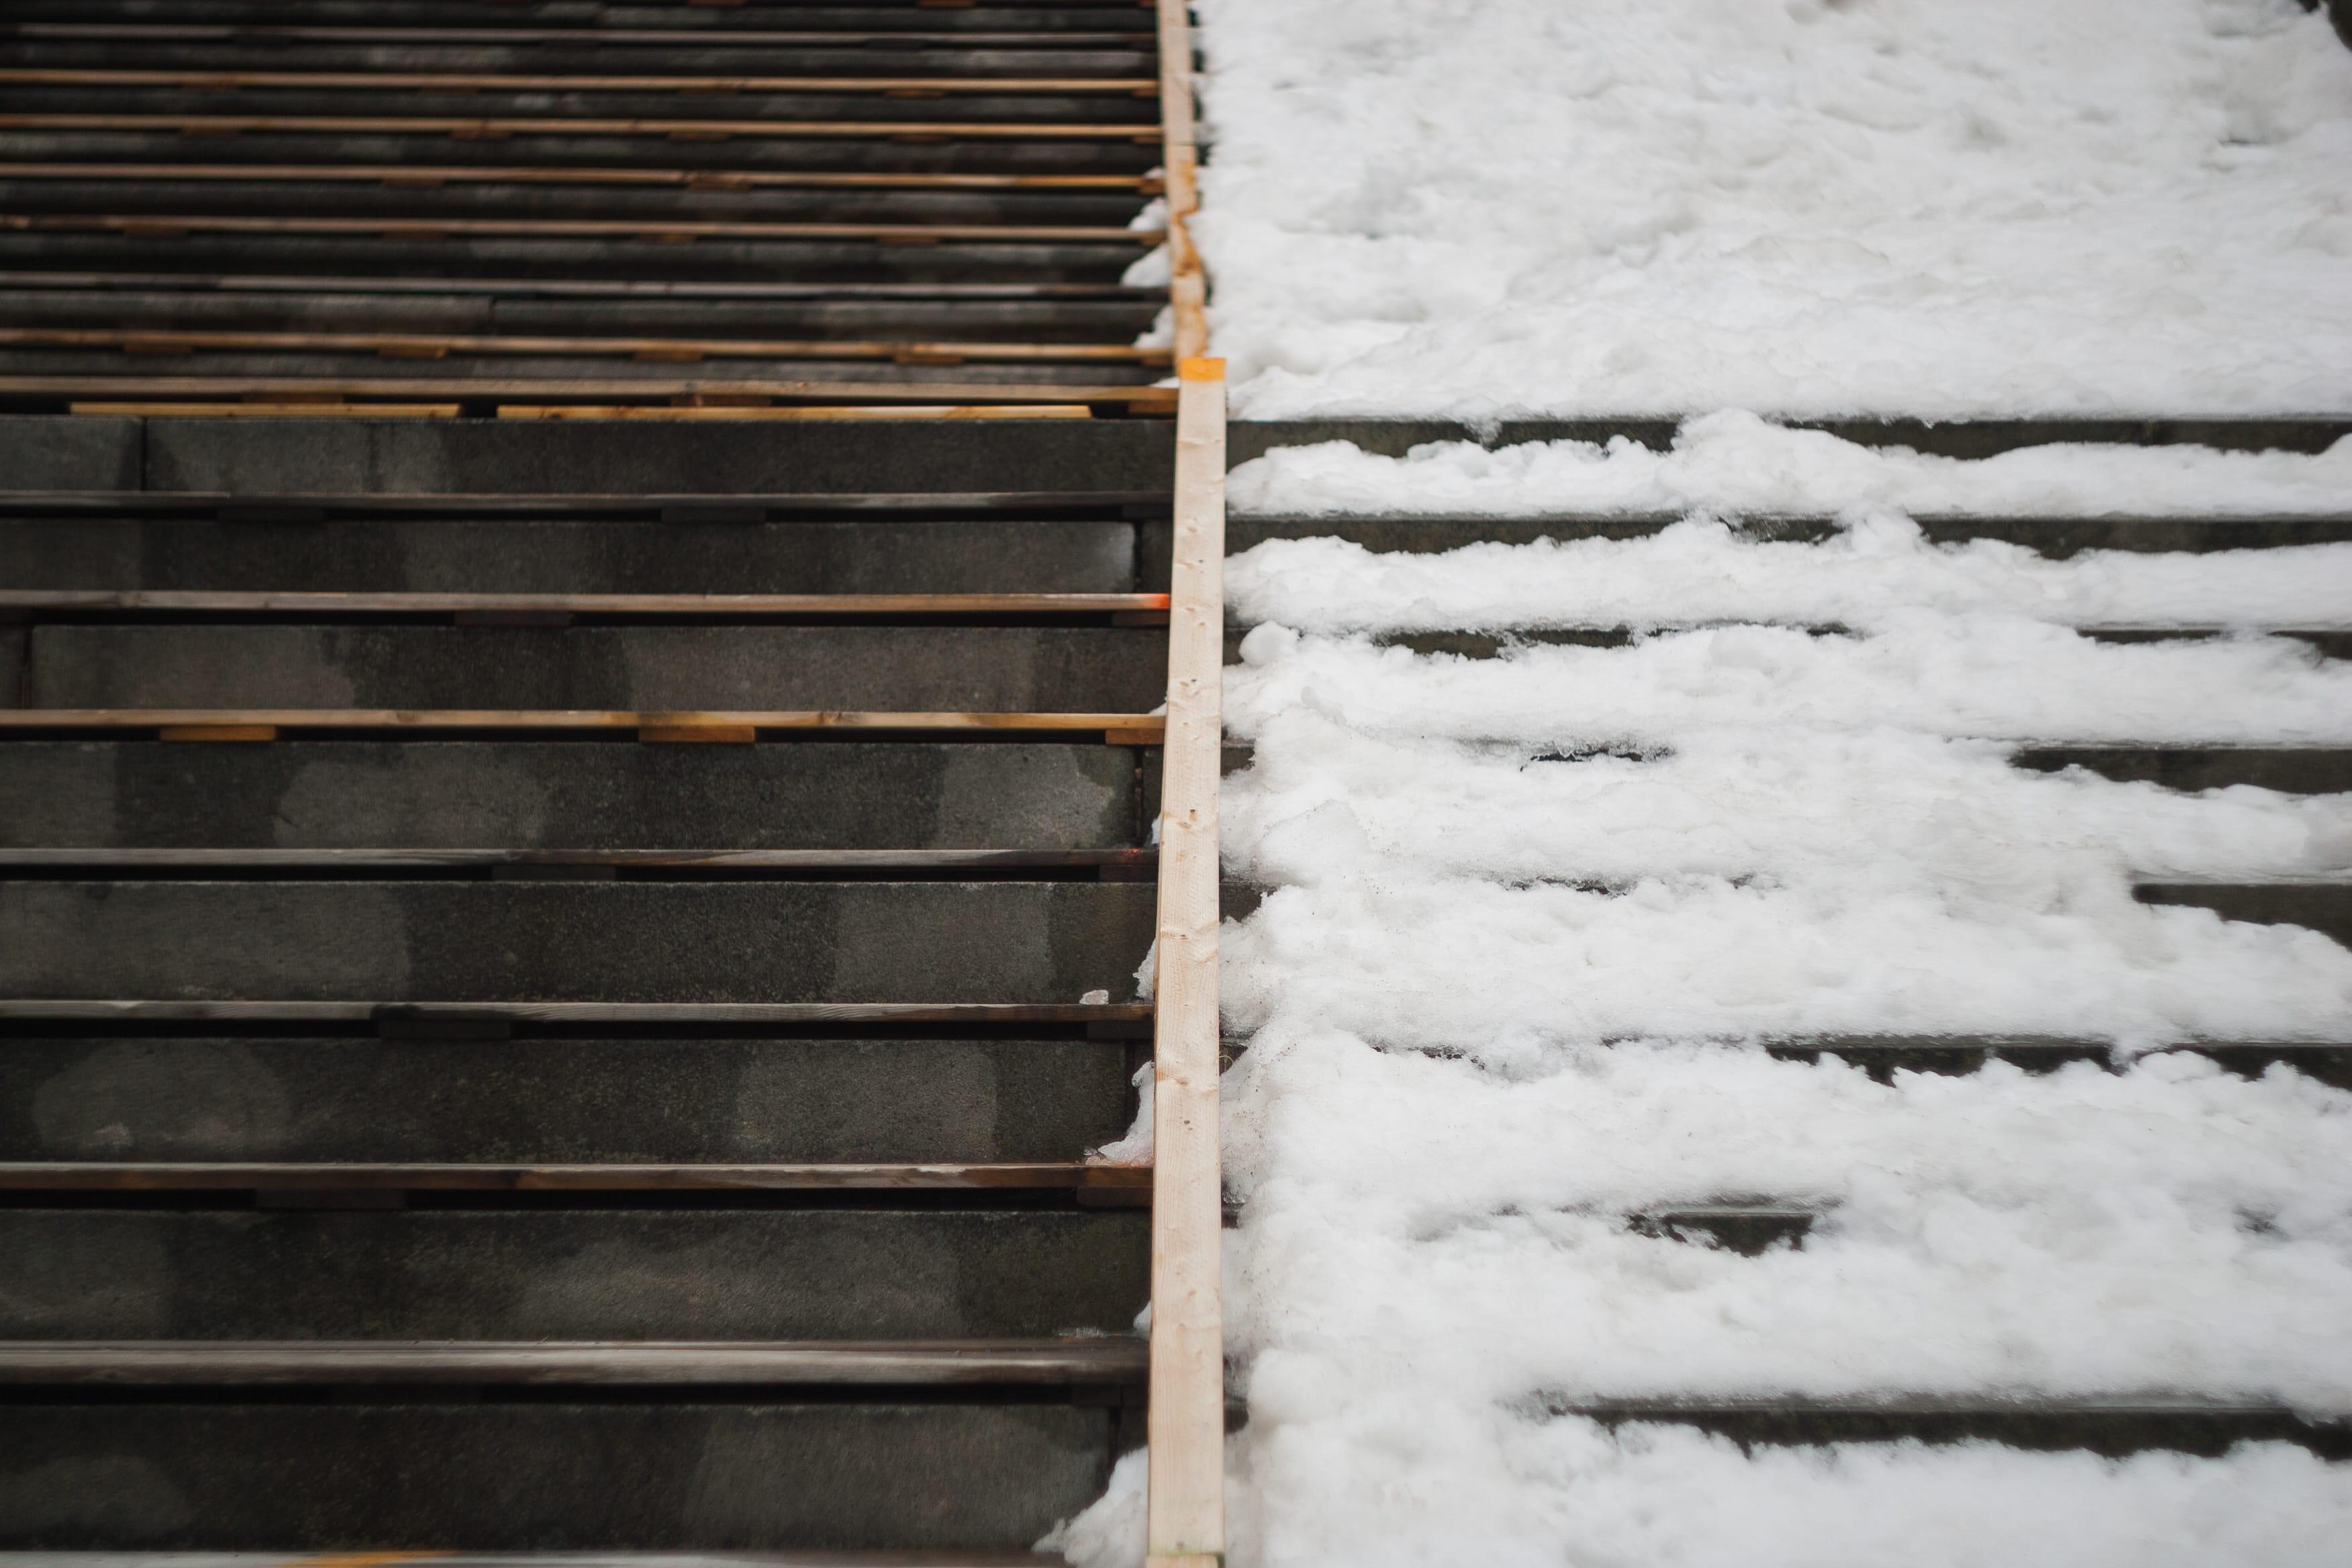 A photograph depicting Half and Half Snowy Steps Saint John Highschool